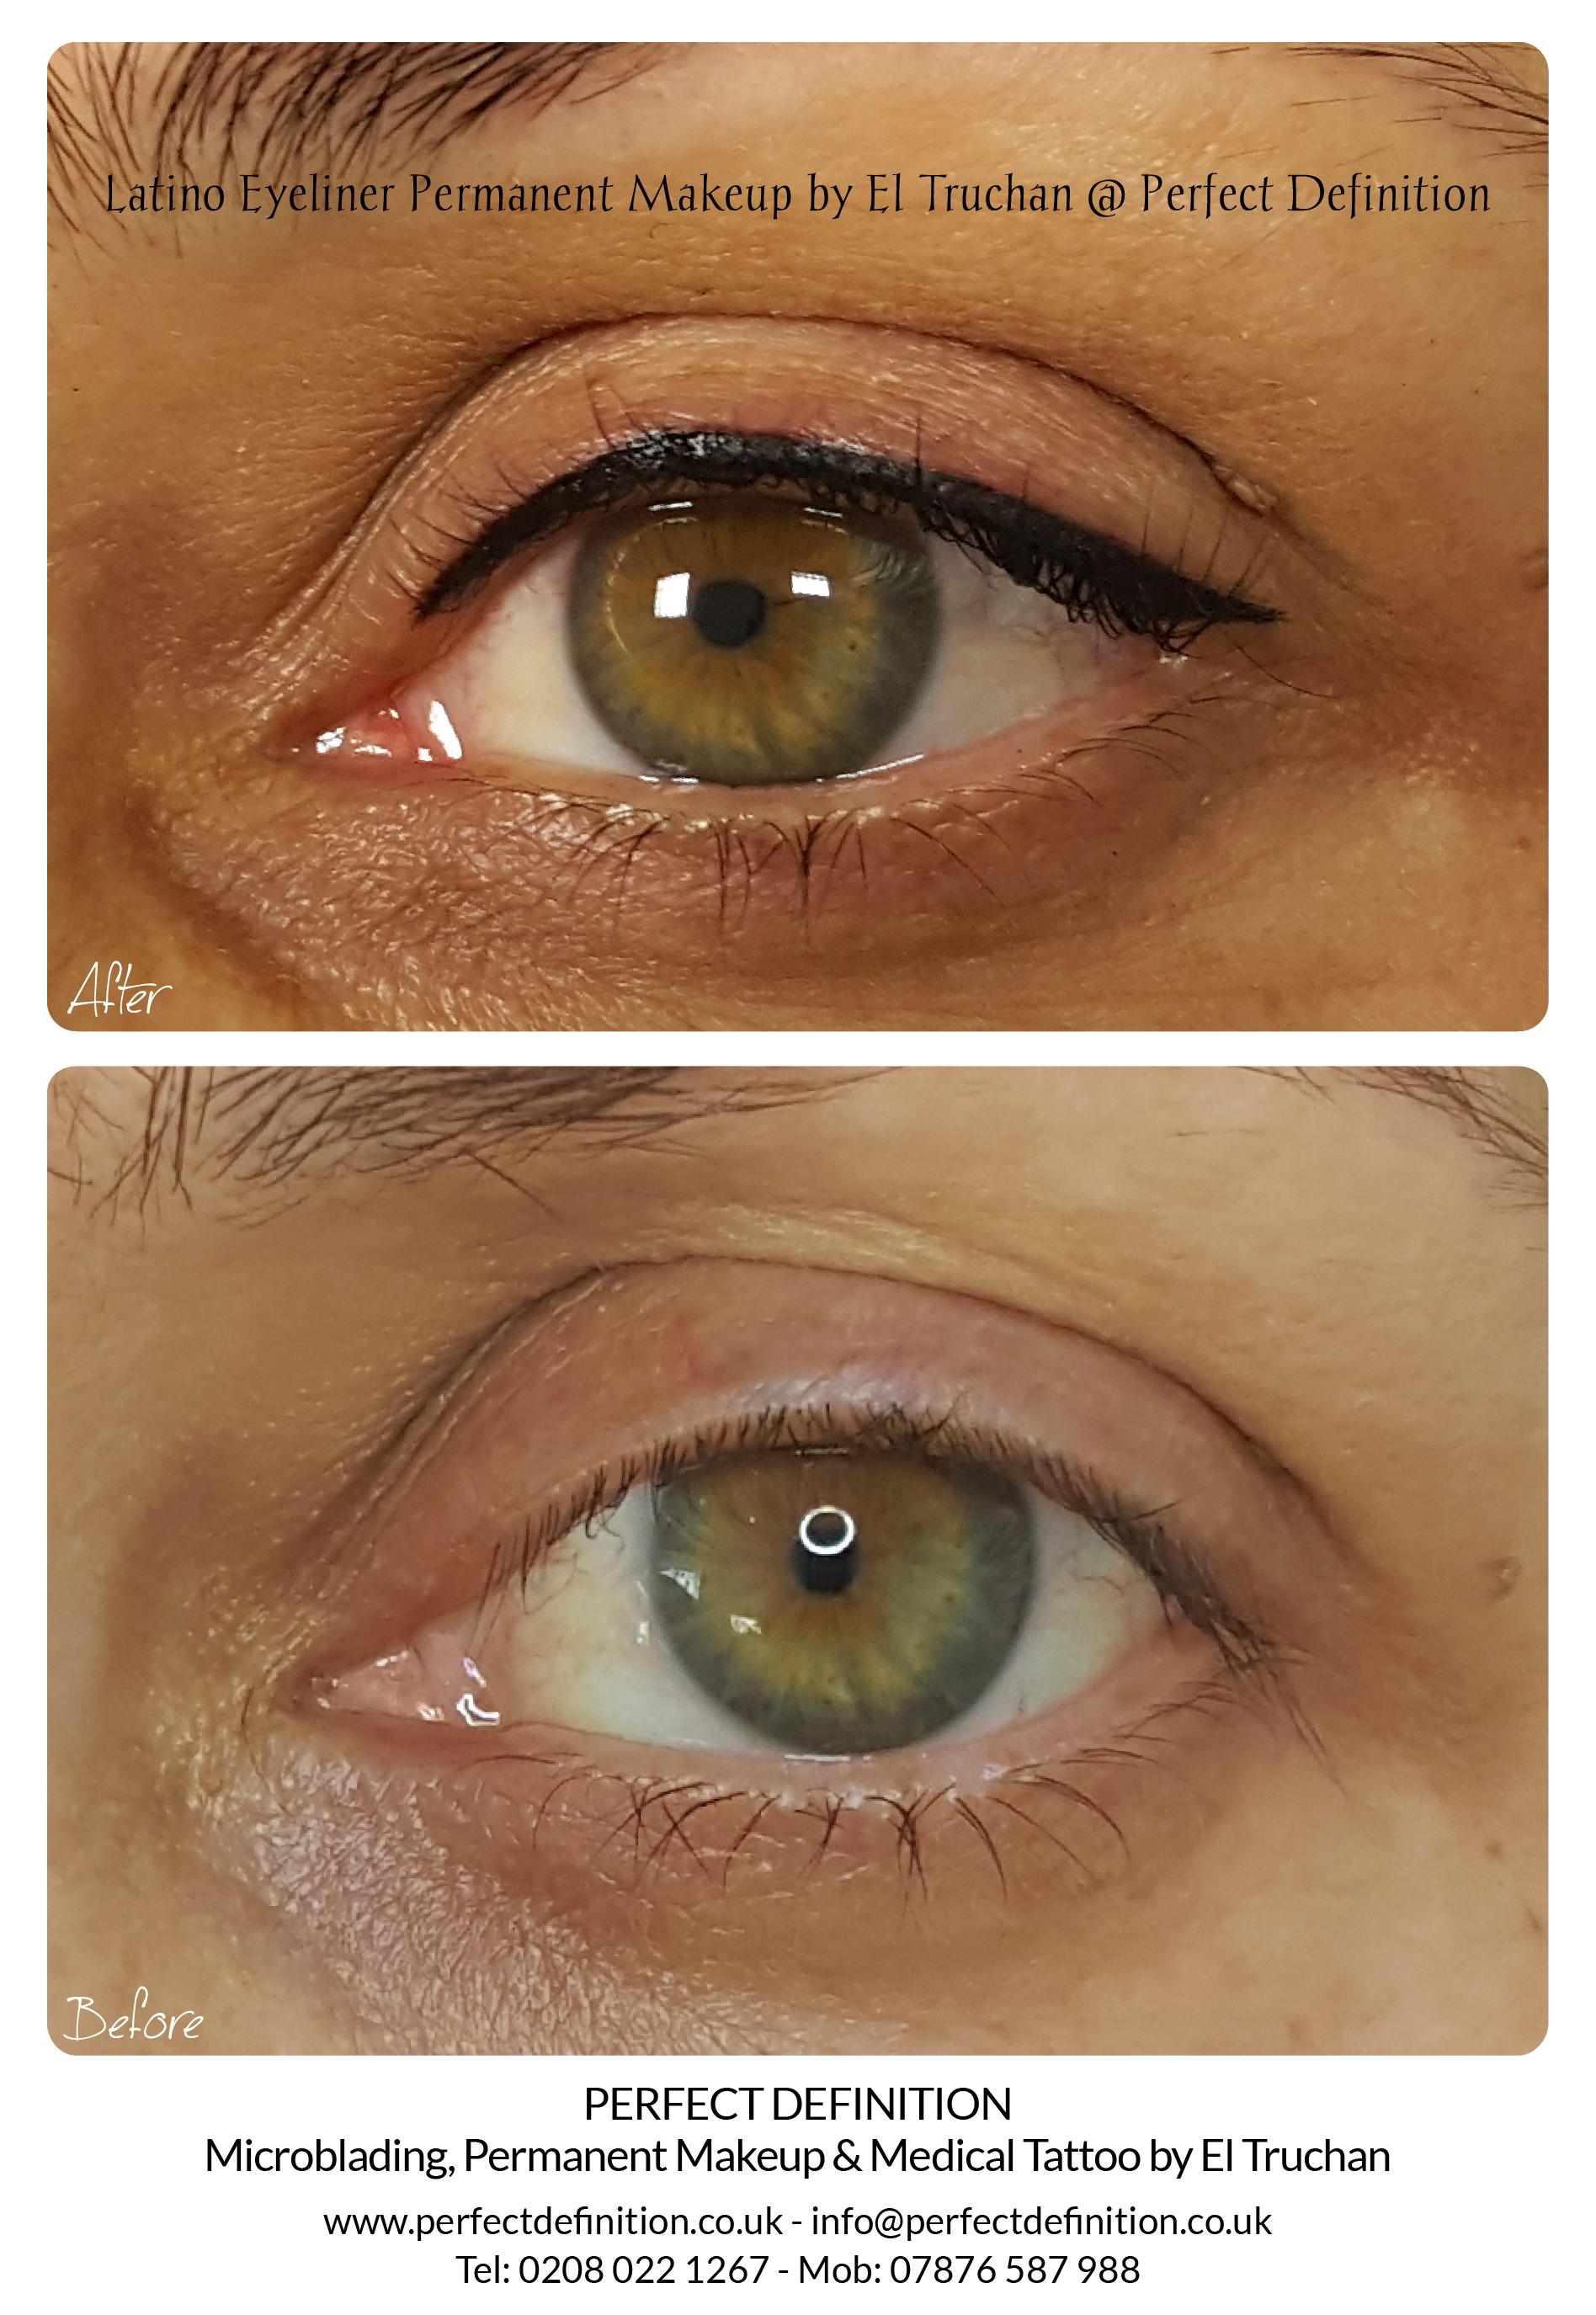 Latino Eyeliner Permanent Makeup by El Truchan @ Perfect Definition _1591.jpg